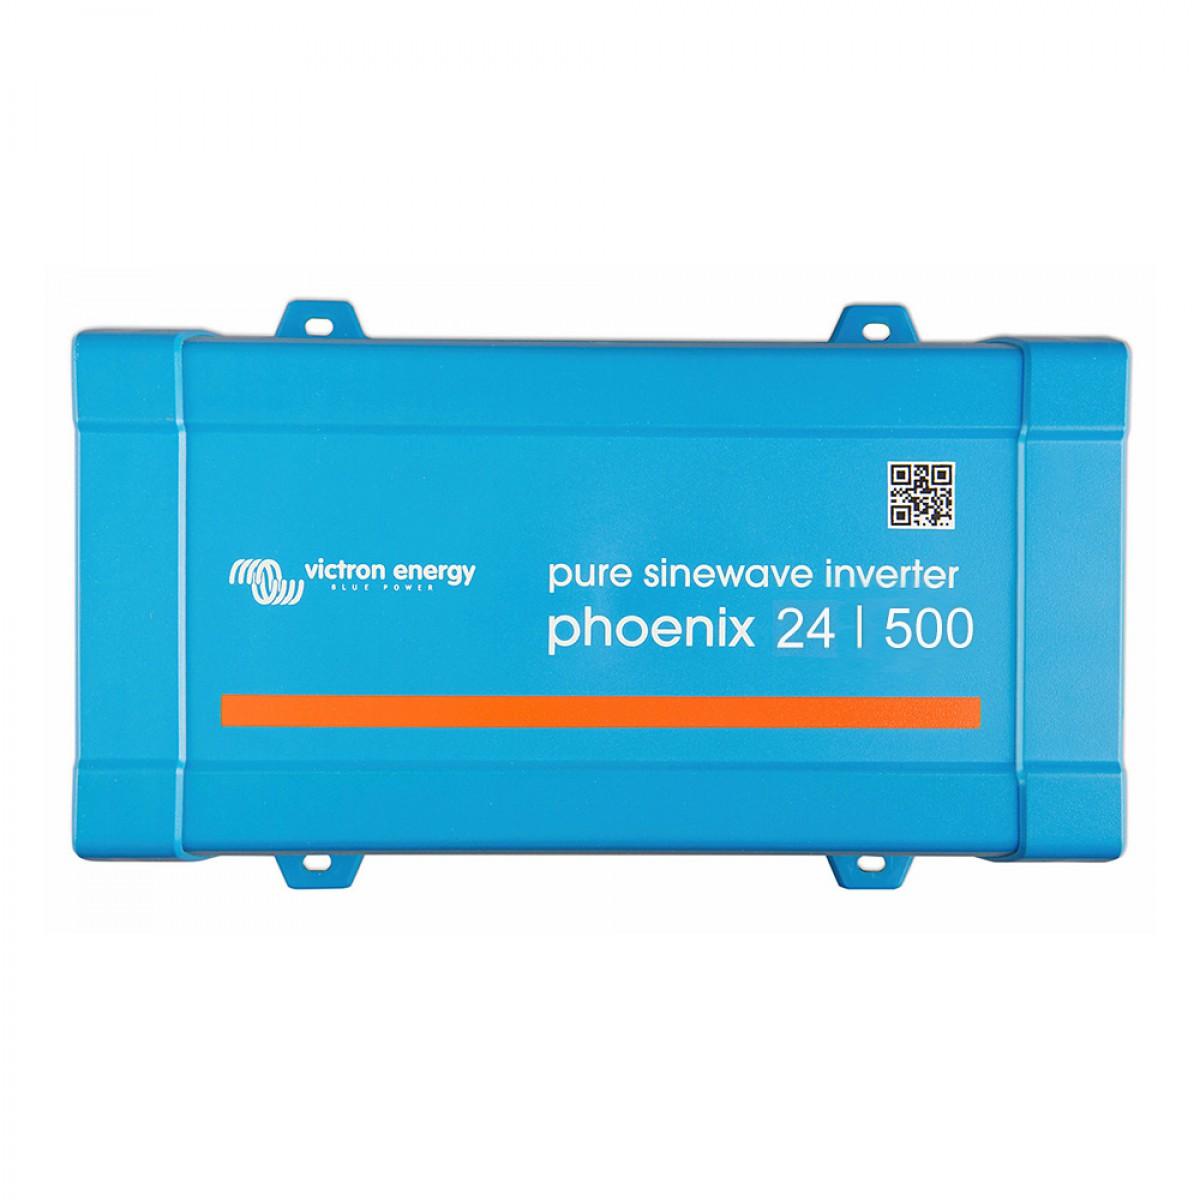 1 Stk Inselwechselrichter 24V 500W PVBI50024-